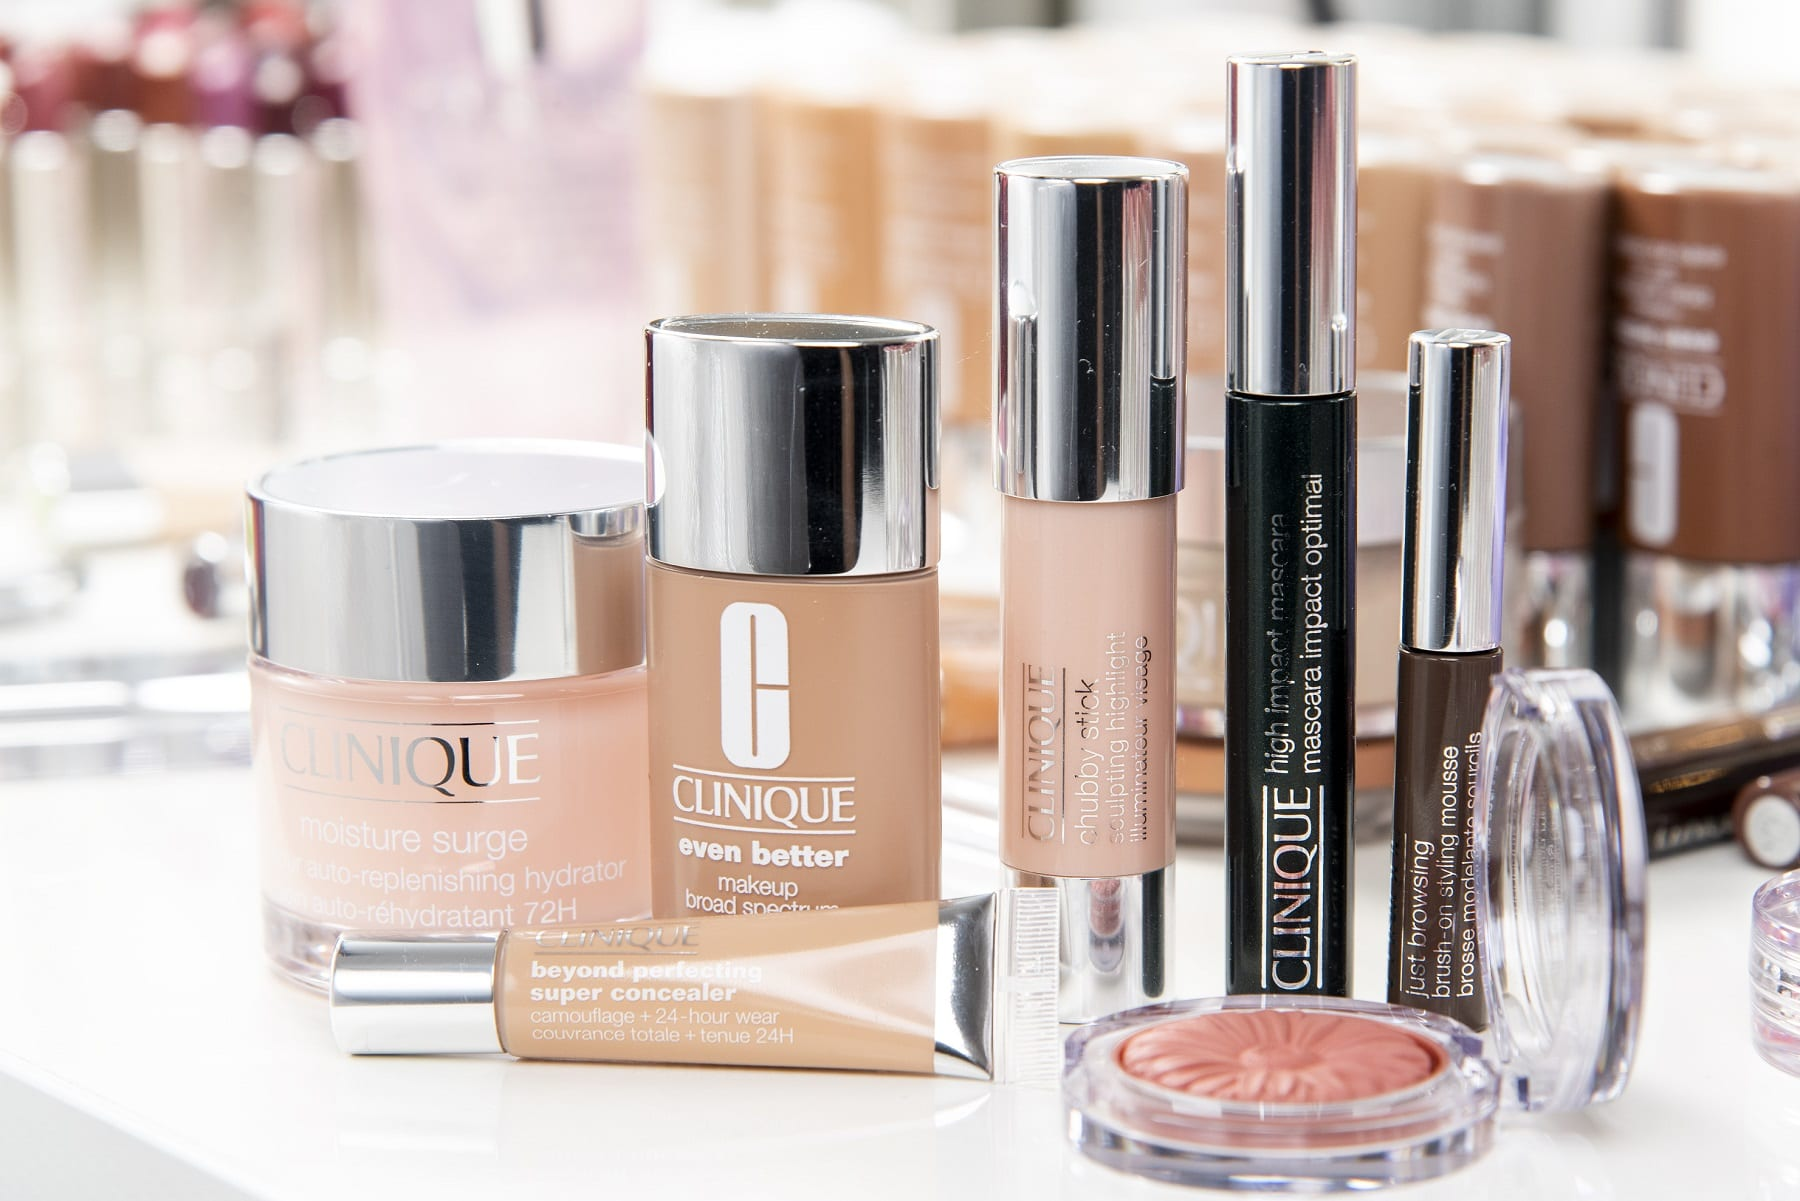 Our Top 6 Clinique Skincare Picks